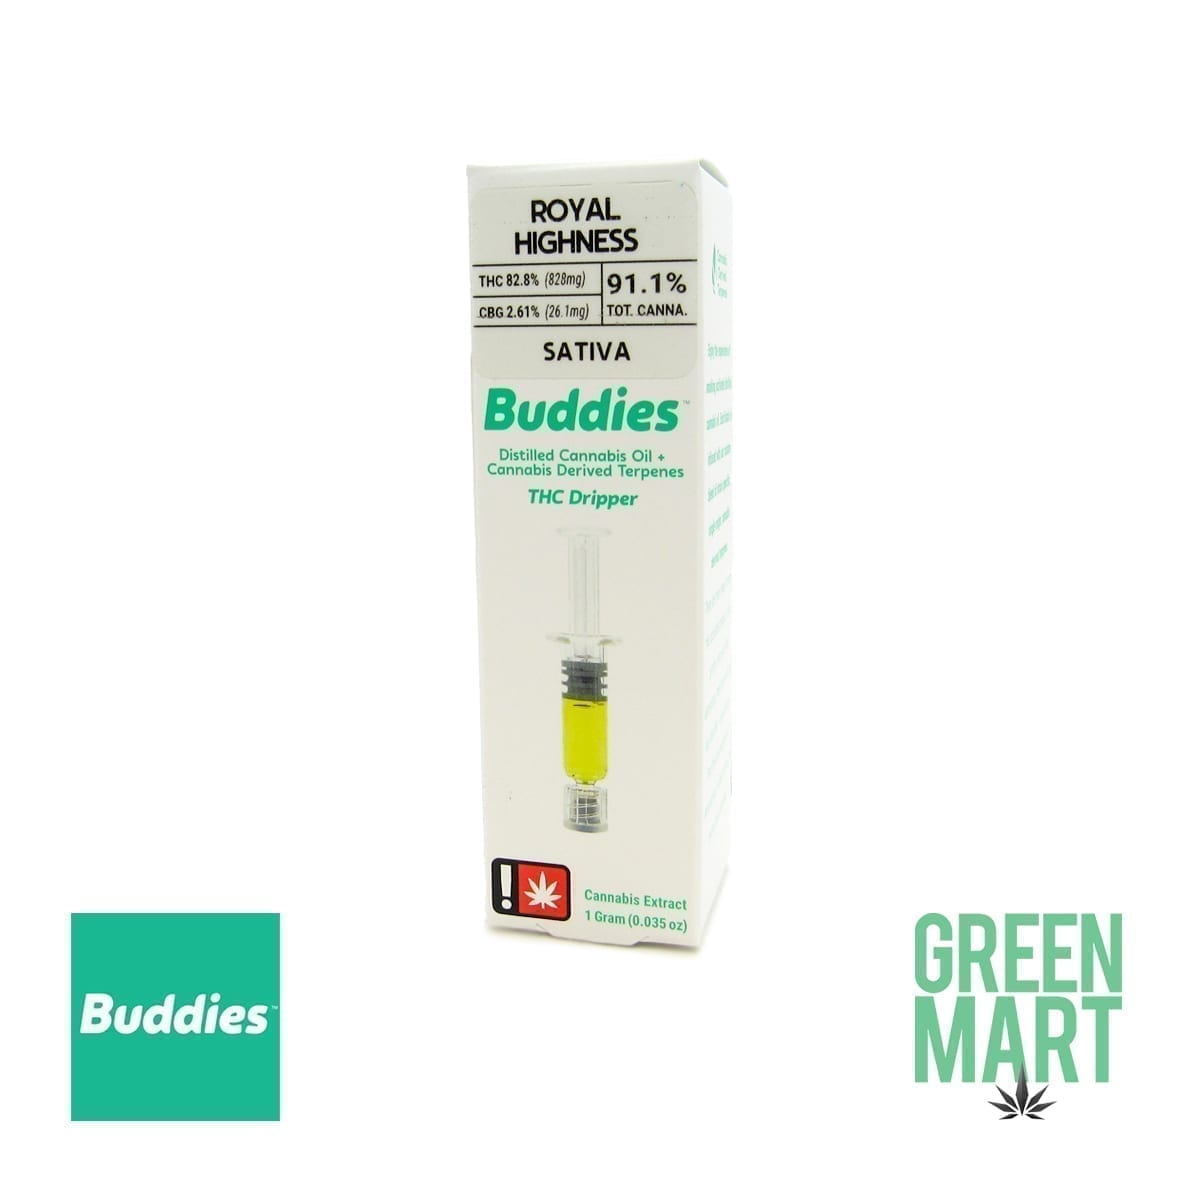 Buddies Brand THC Dripper - Royal Highness